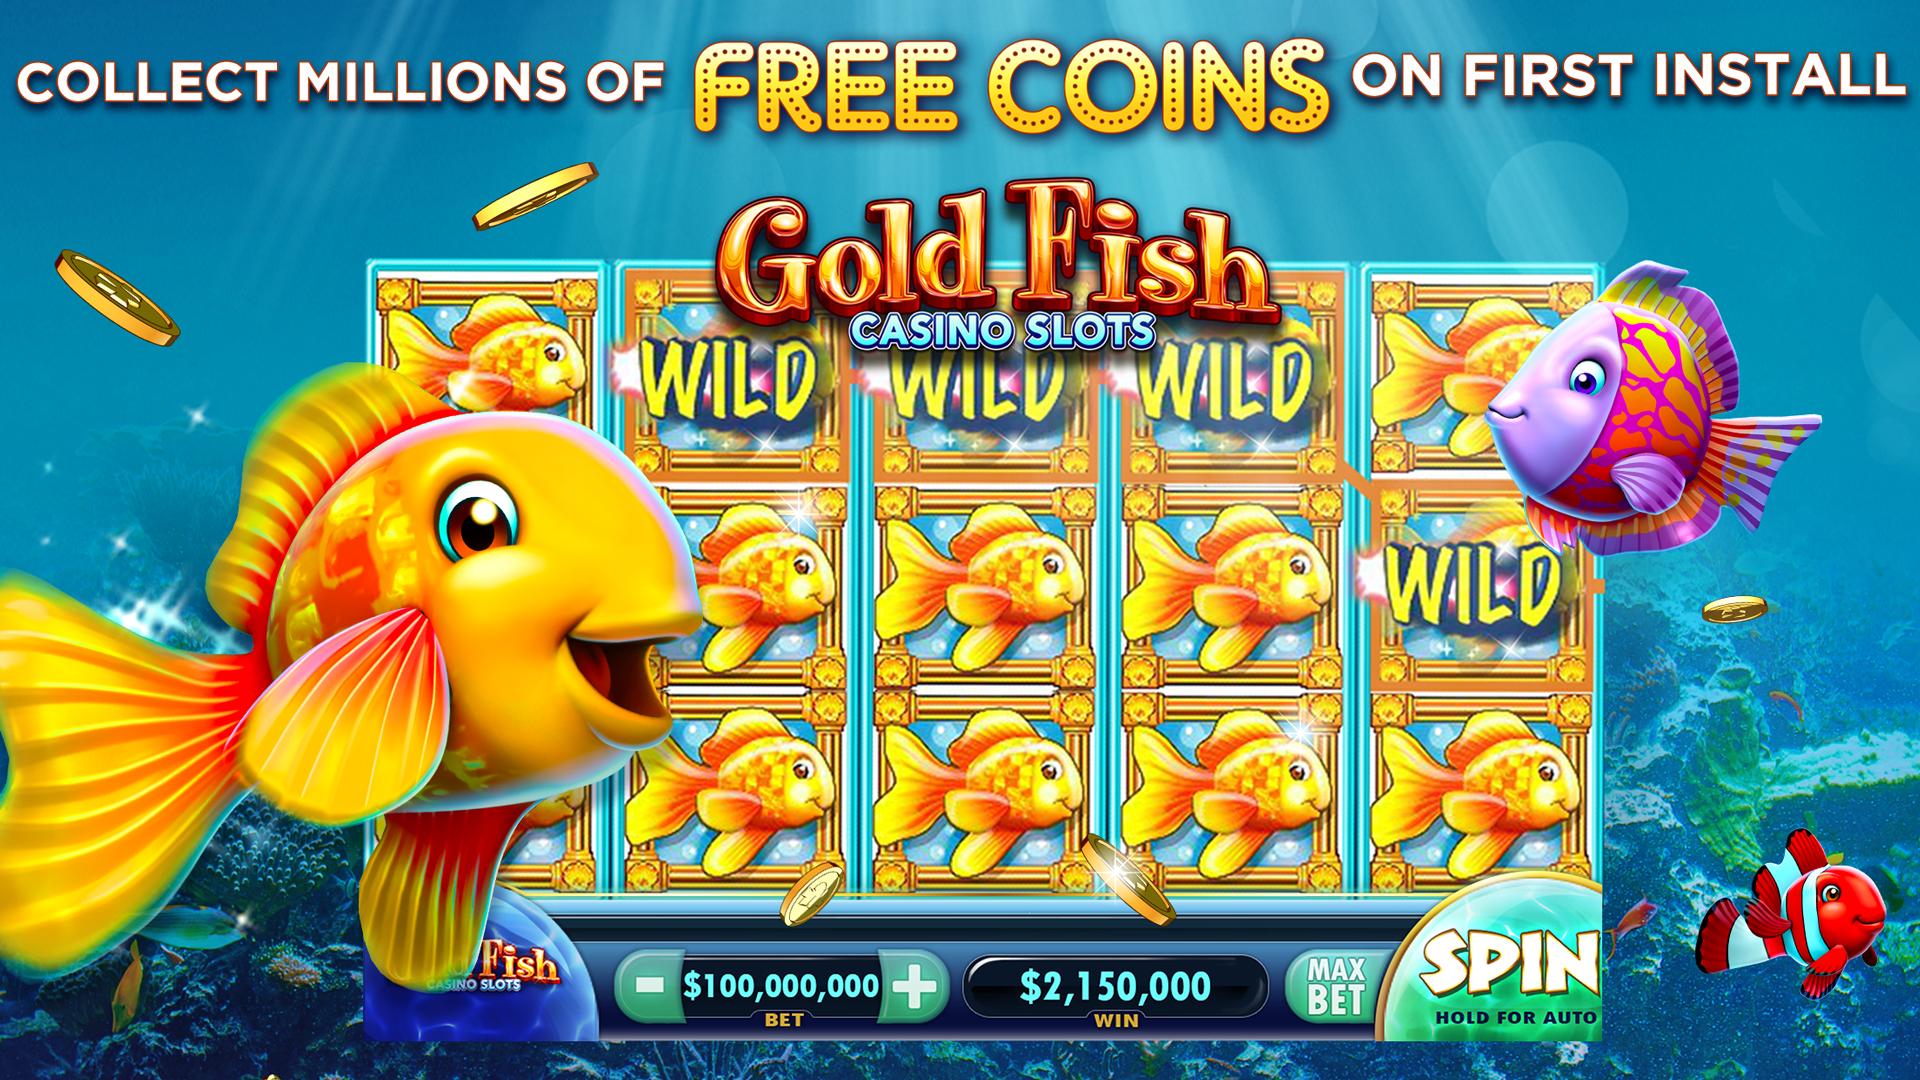 Goldfish Casino Slot